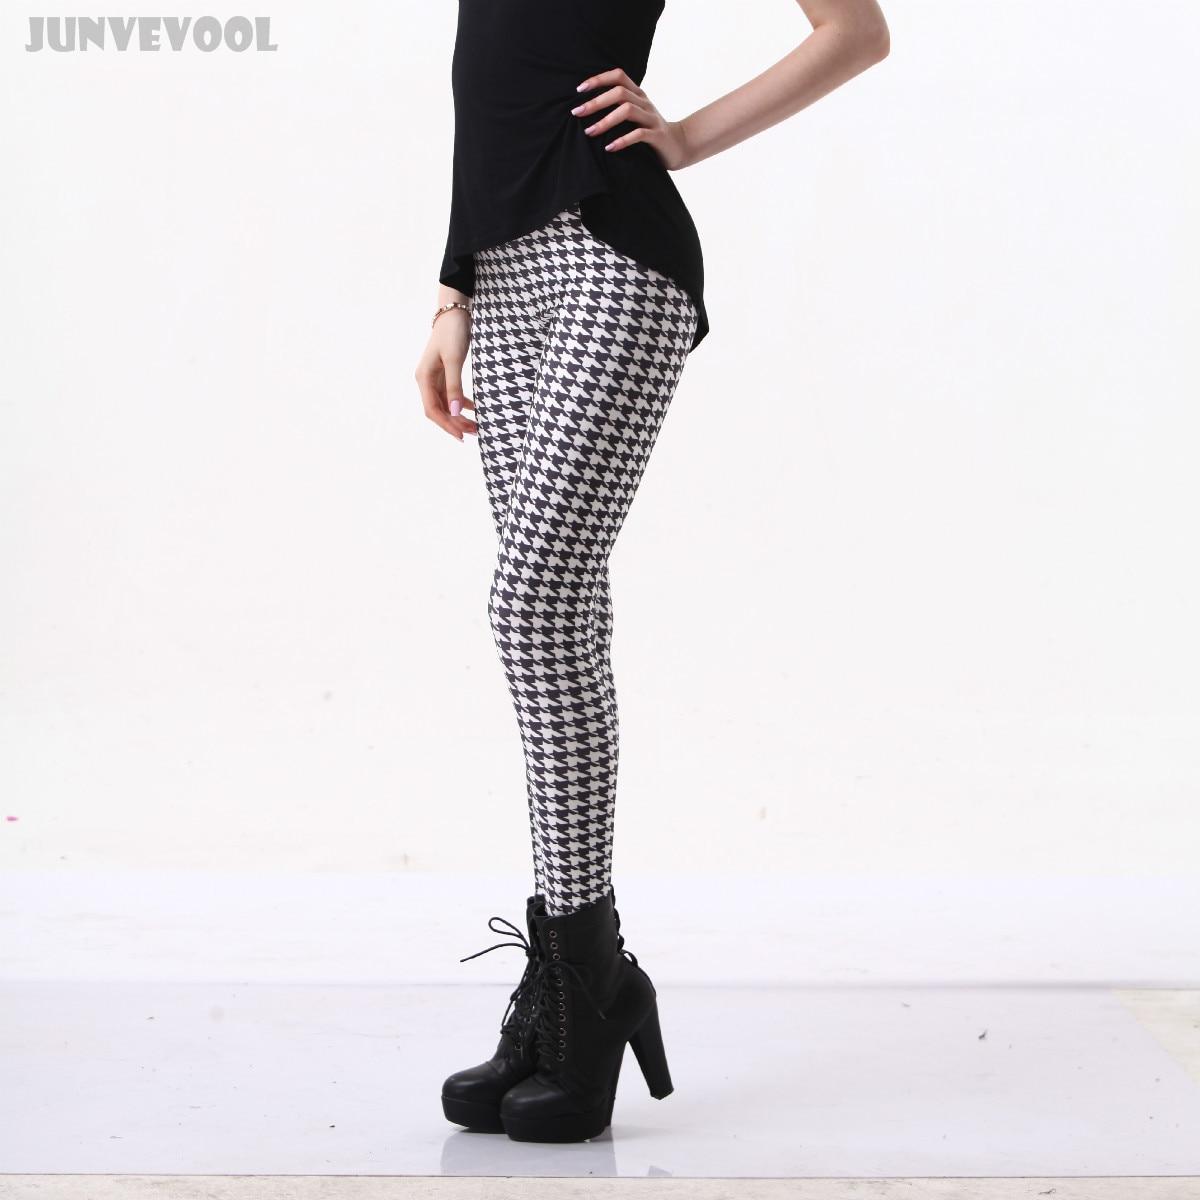 Leggis Womens Leggings Pants Black White Grid Cat Printed Patchwork Trousers Stretch Ankle Length Long Seamless Capris Clubwear